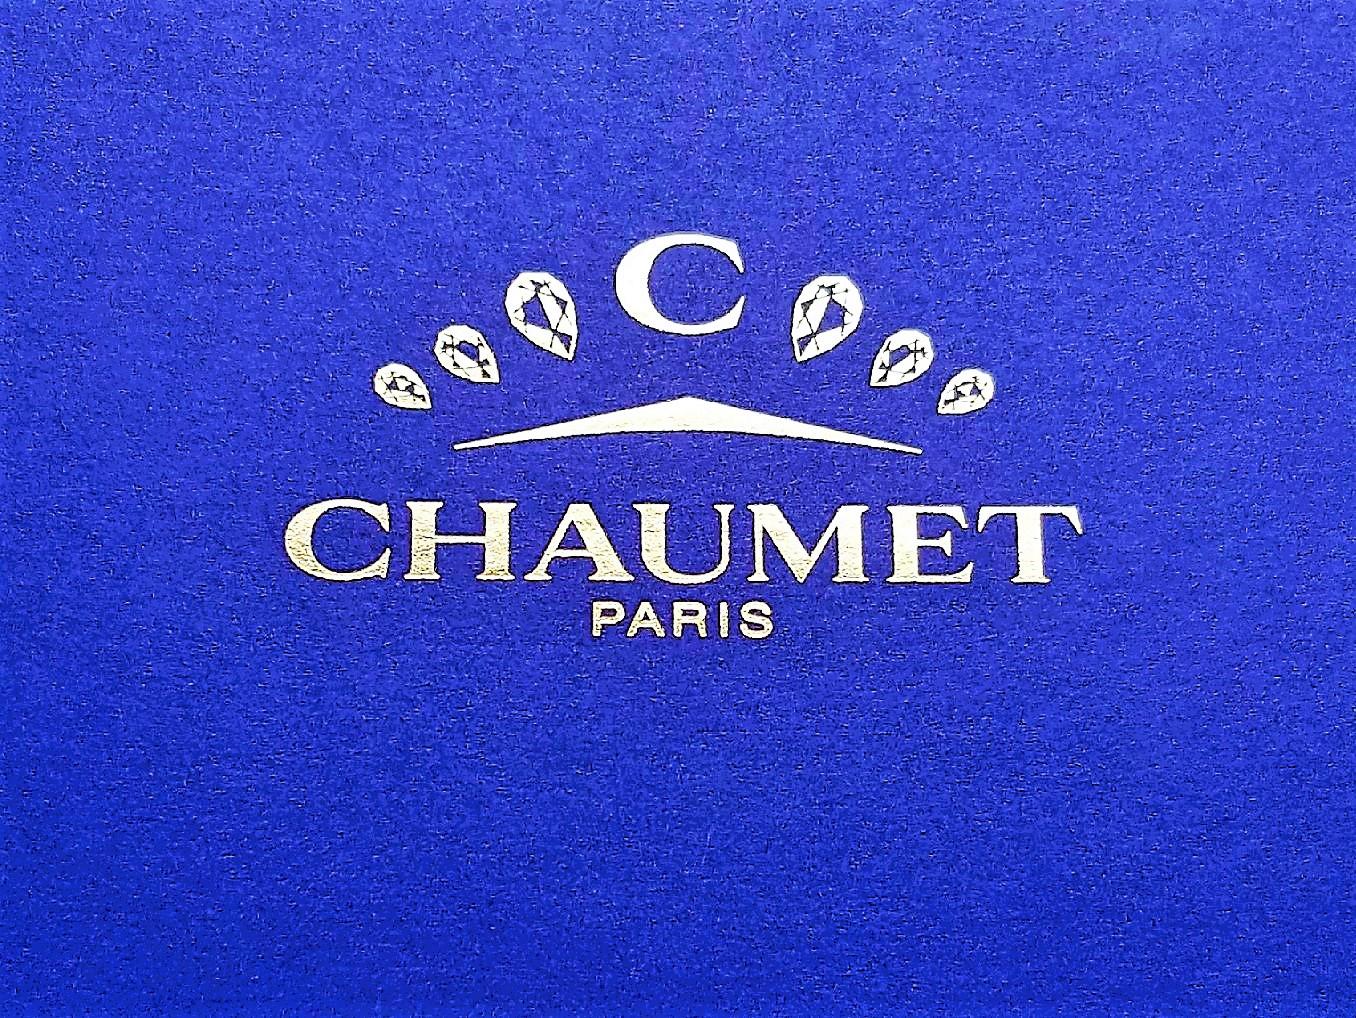 chaumet (2)